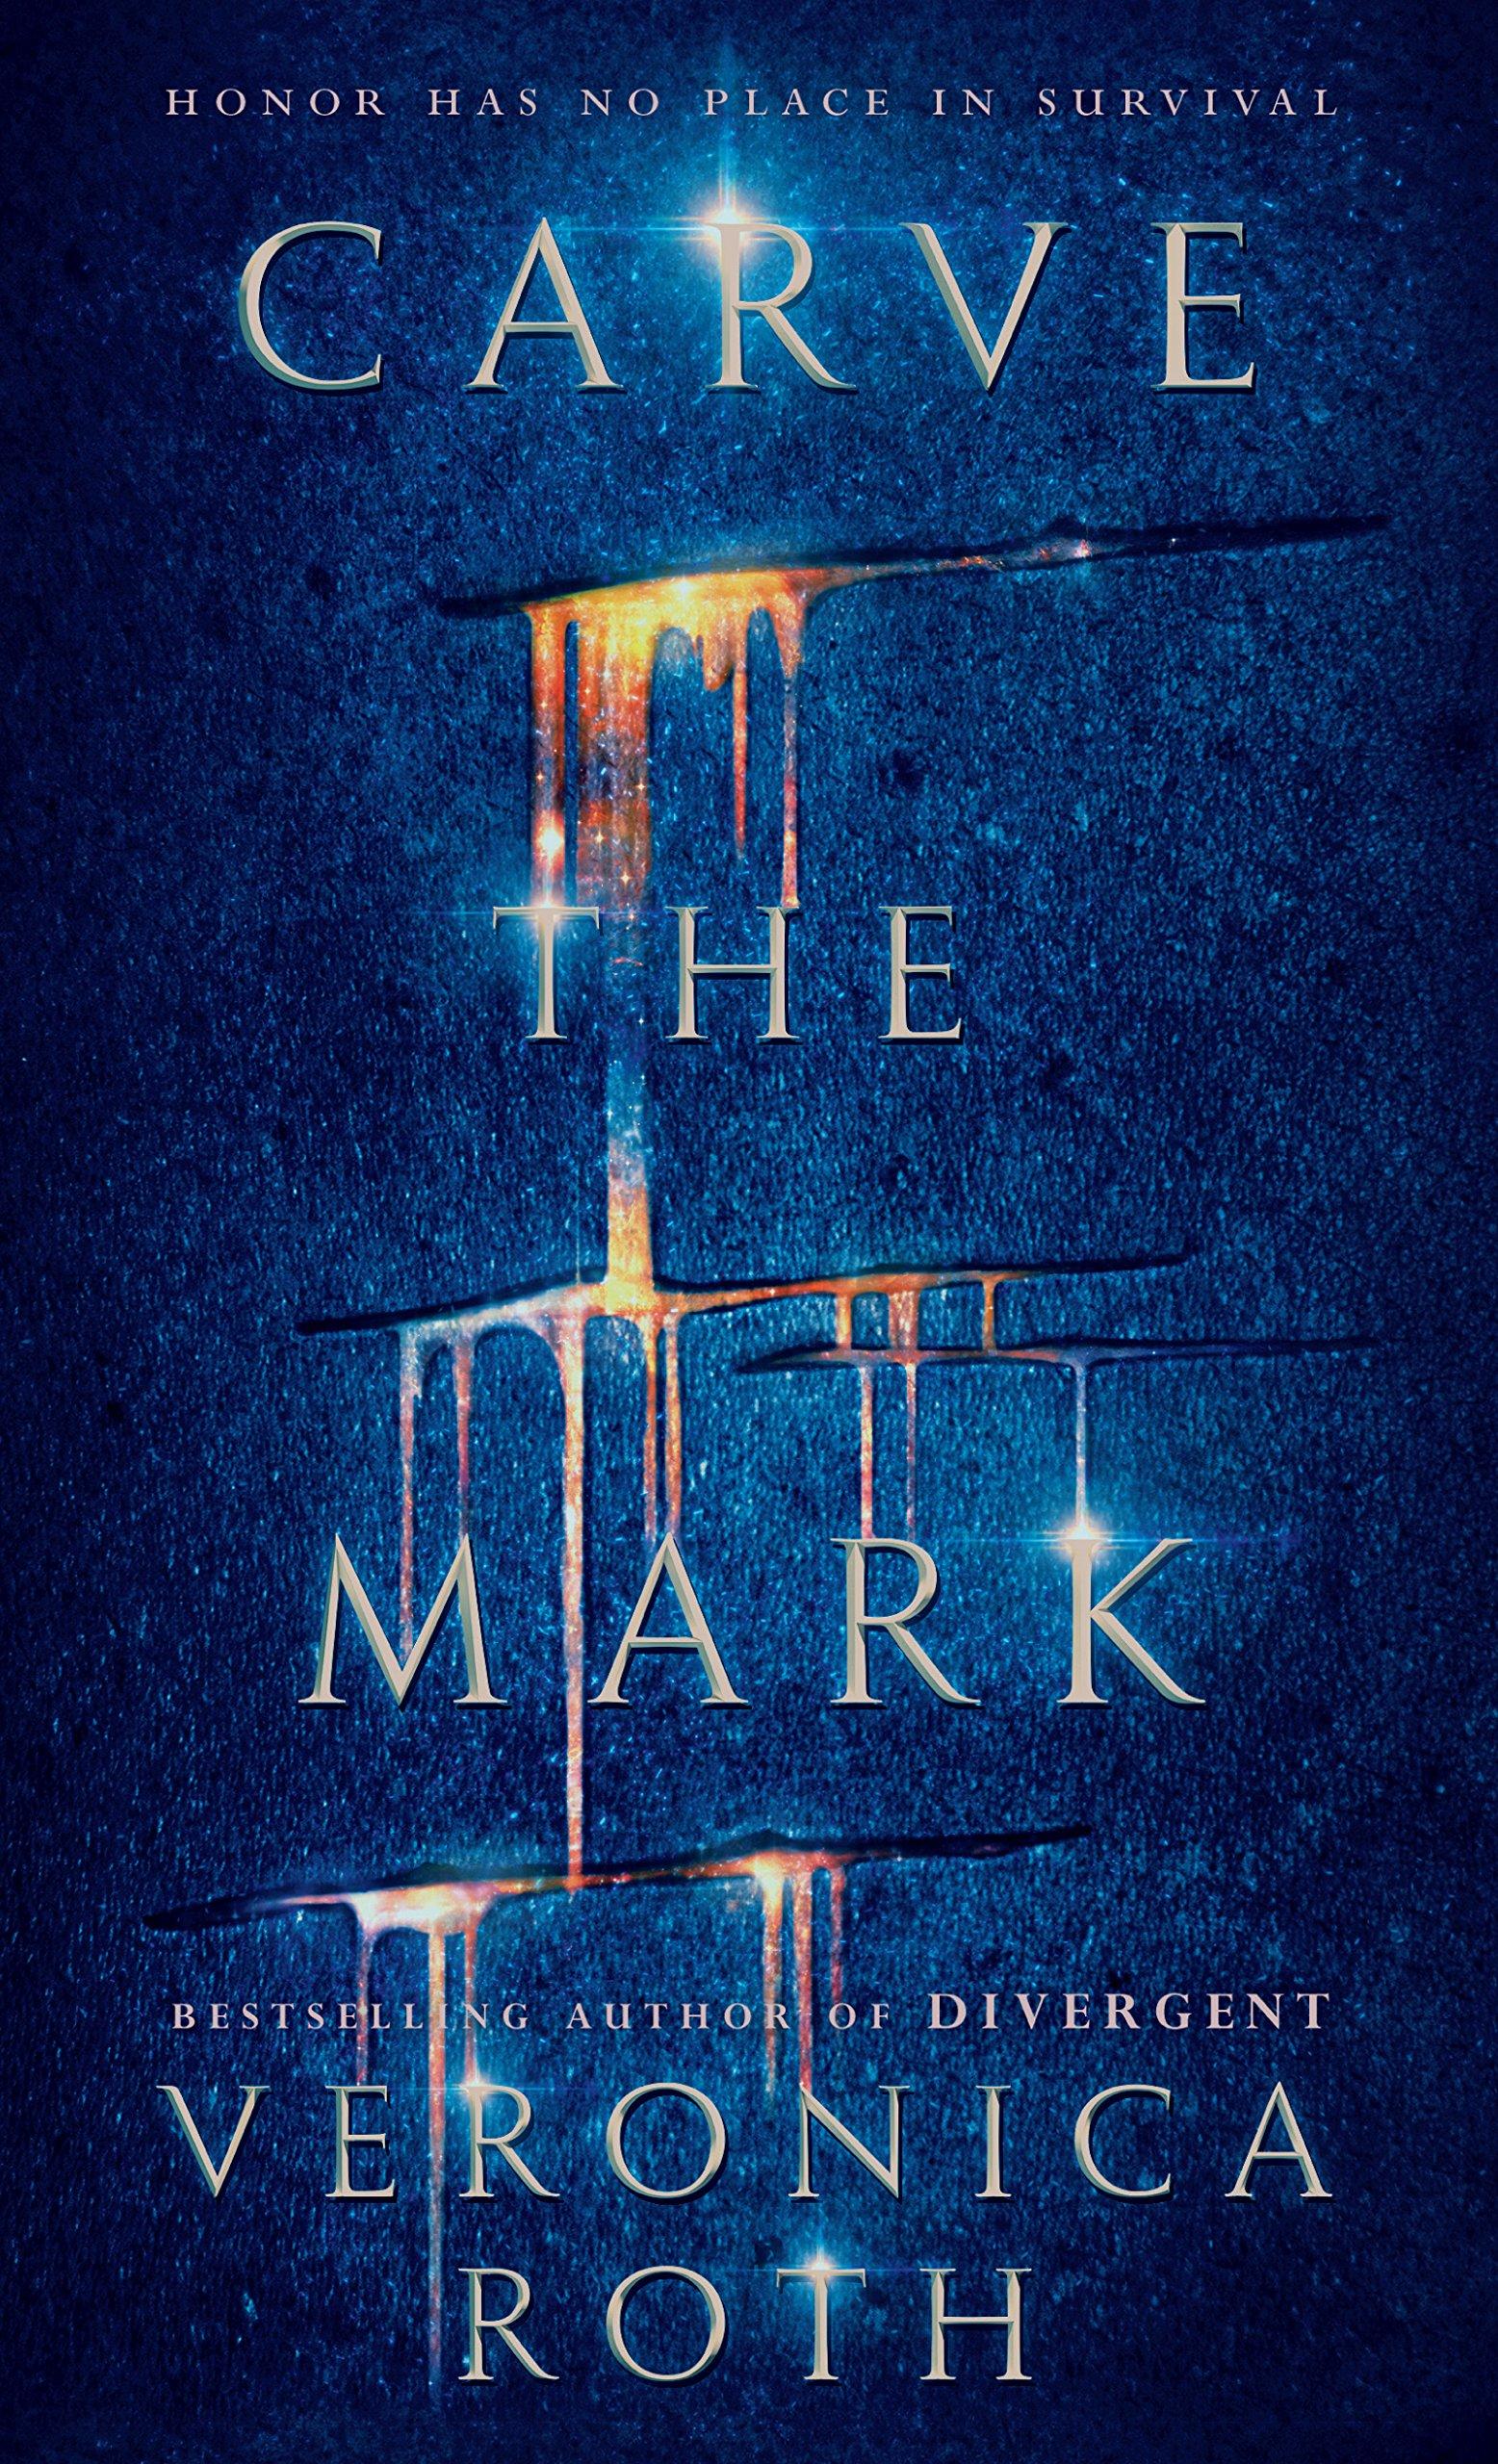 Read Online Carve the Mark (Thorndike Press large print Literacy Bridge) pdf